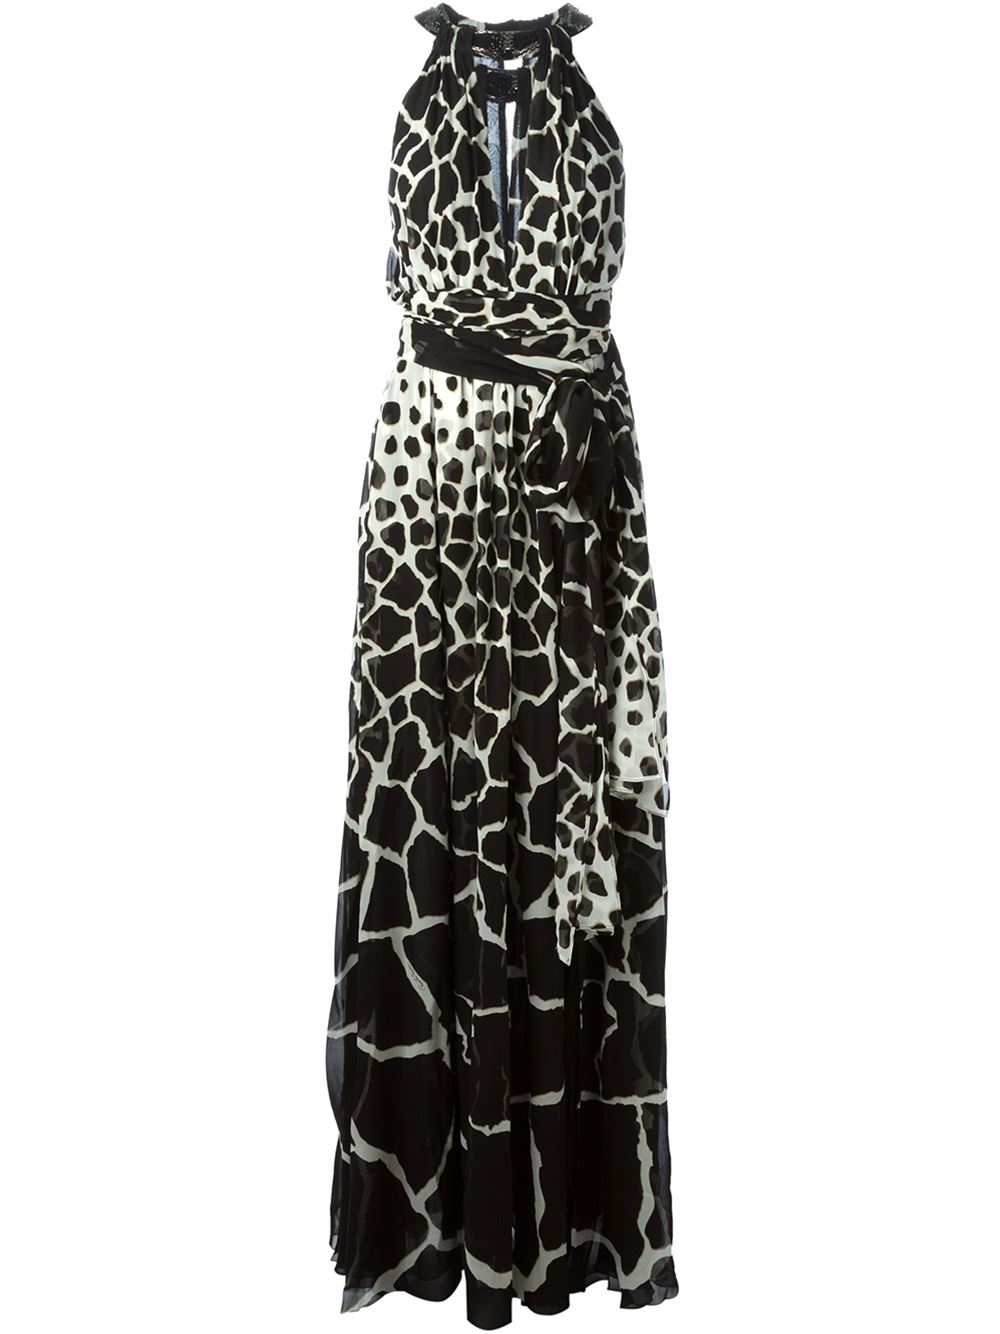 roberto cavalli animal print maxi dress in black lyst